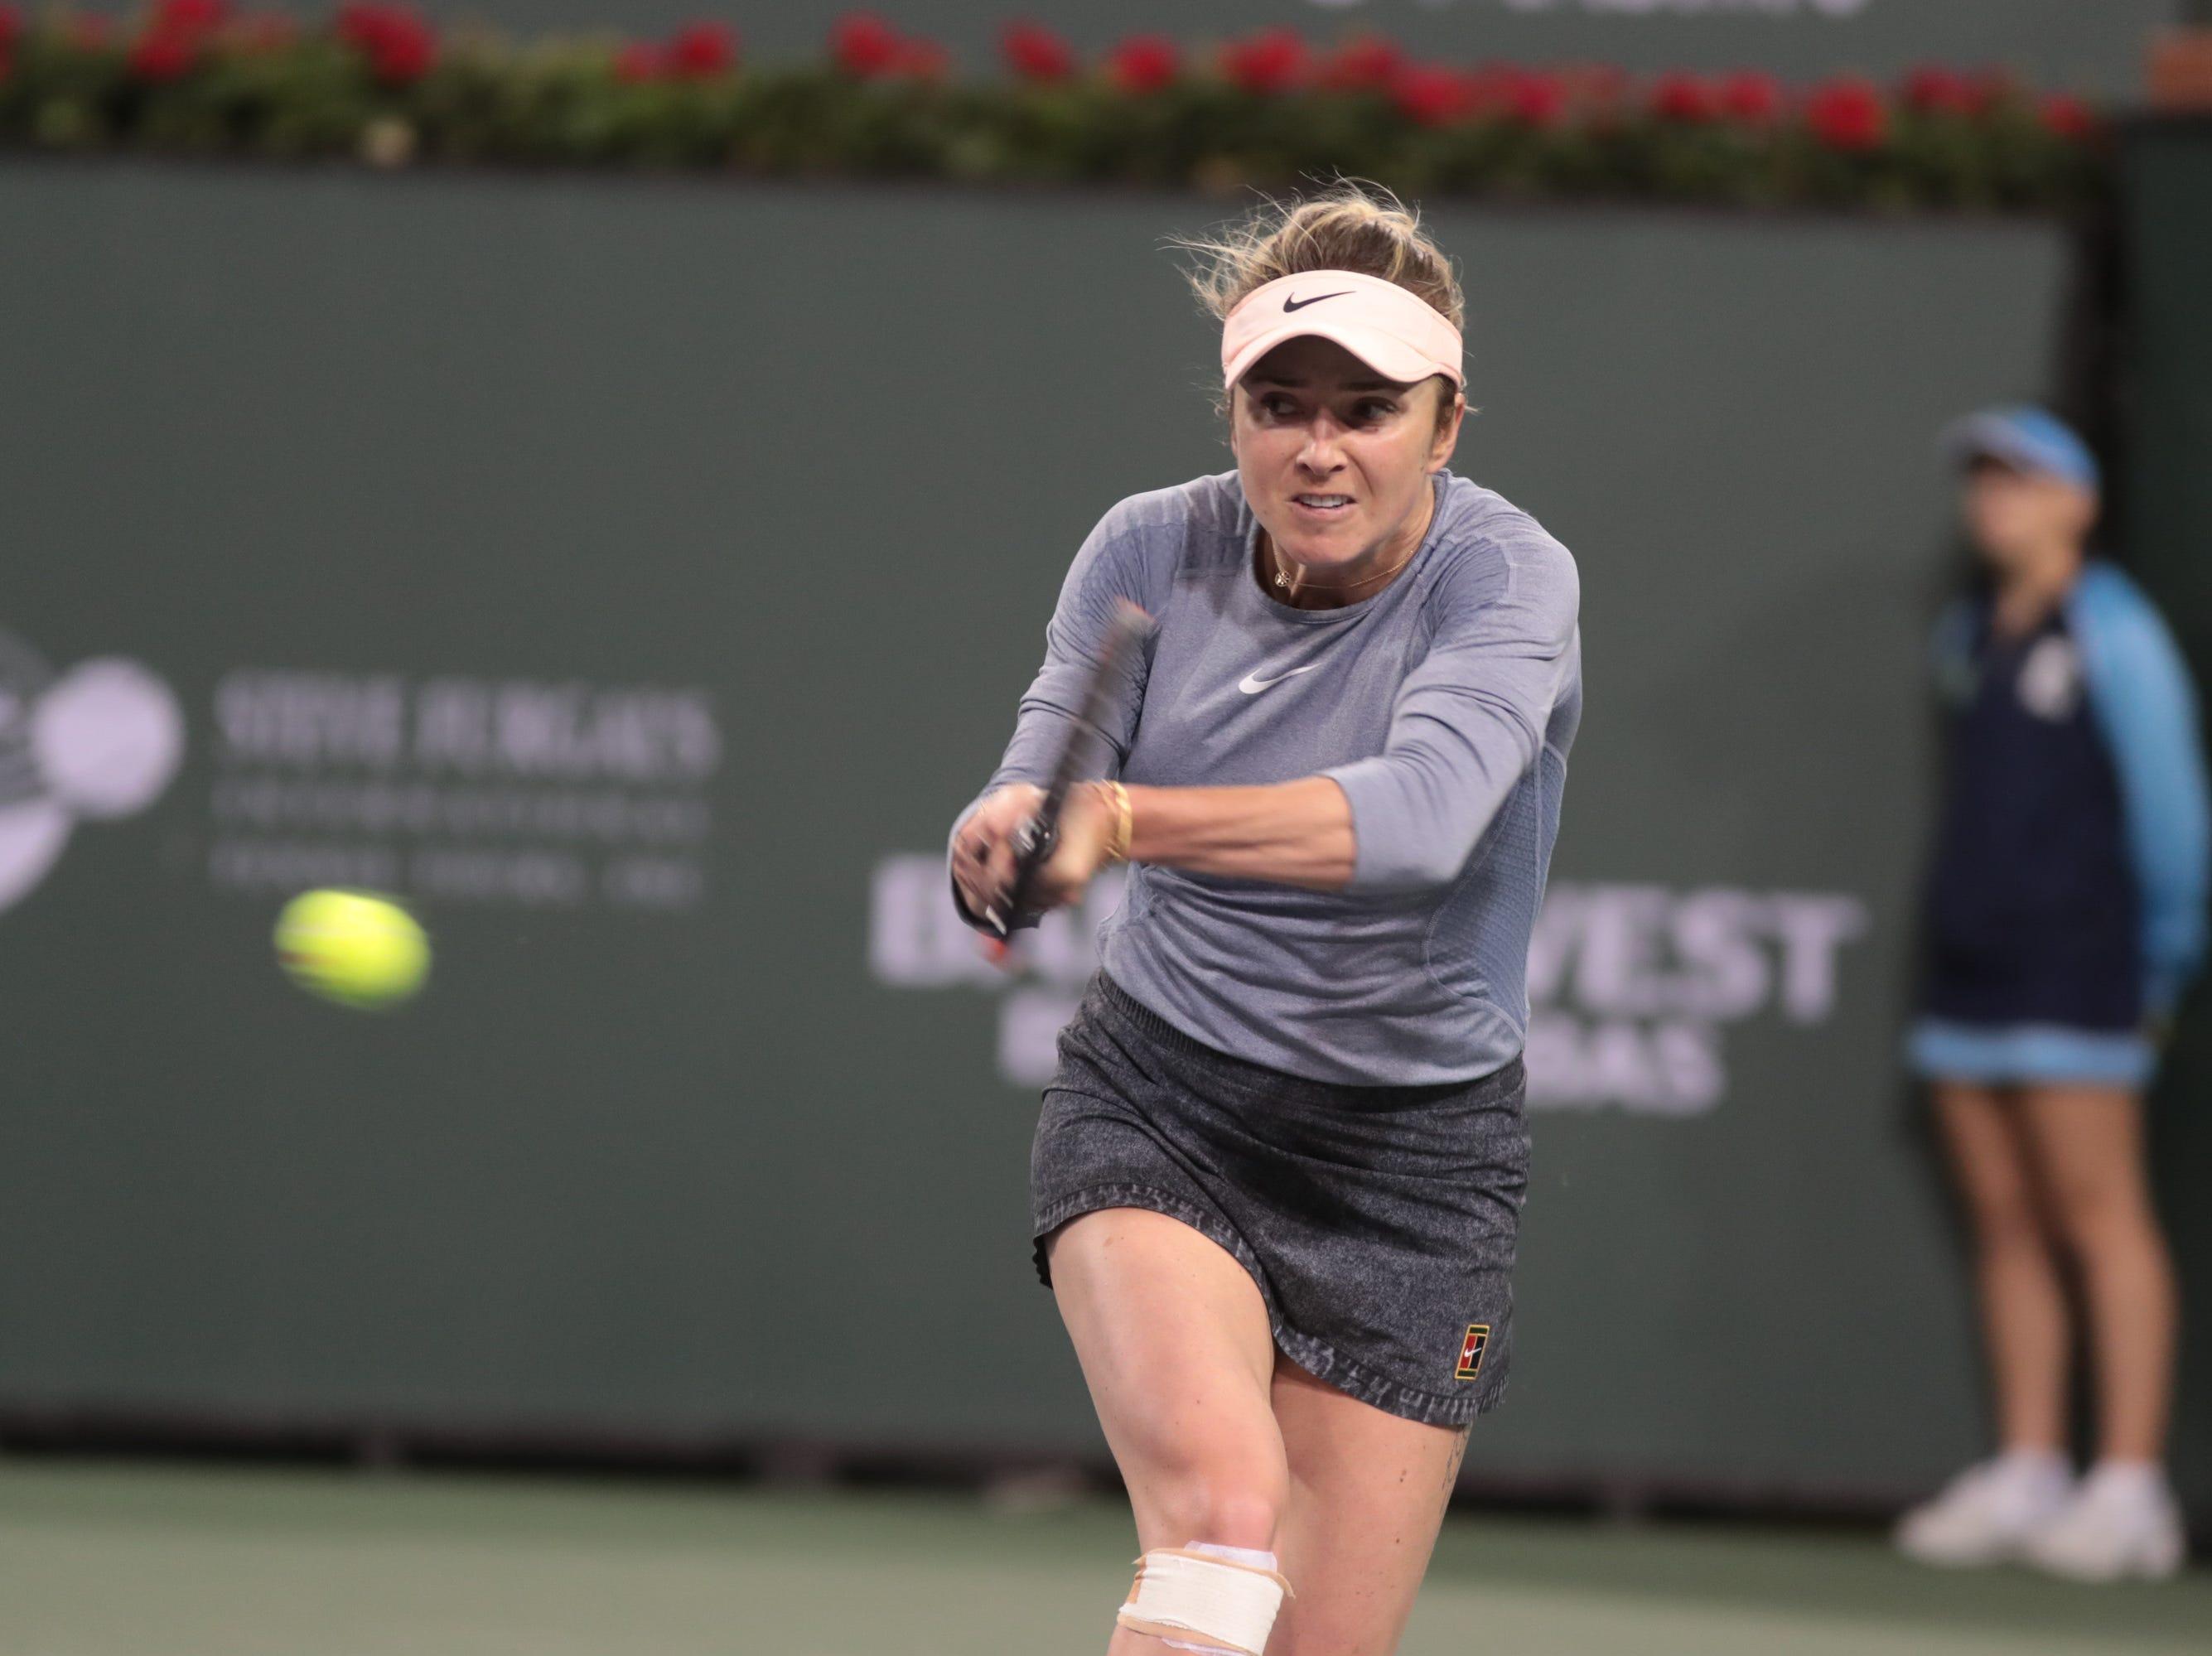 Elina Svitolina hits a backhand to Marketa Vondrousova at the BNP Paribas Open in Indian Wells, Calif., March 13, 2019.